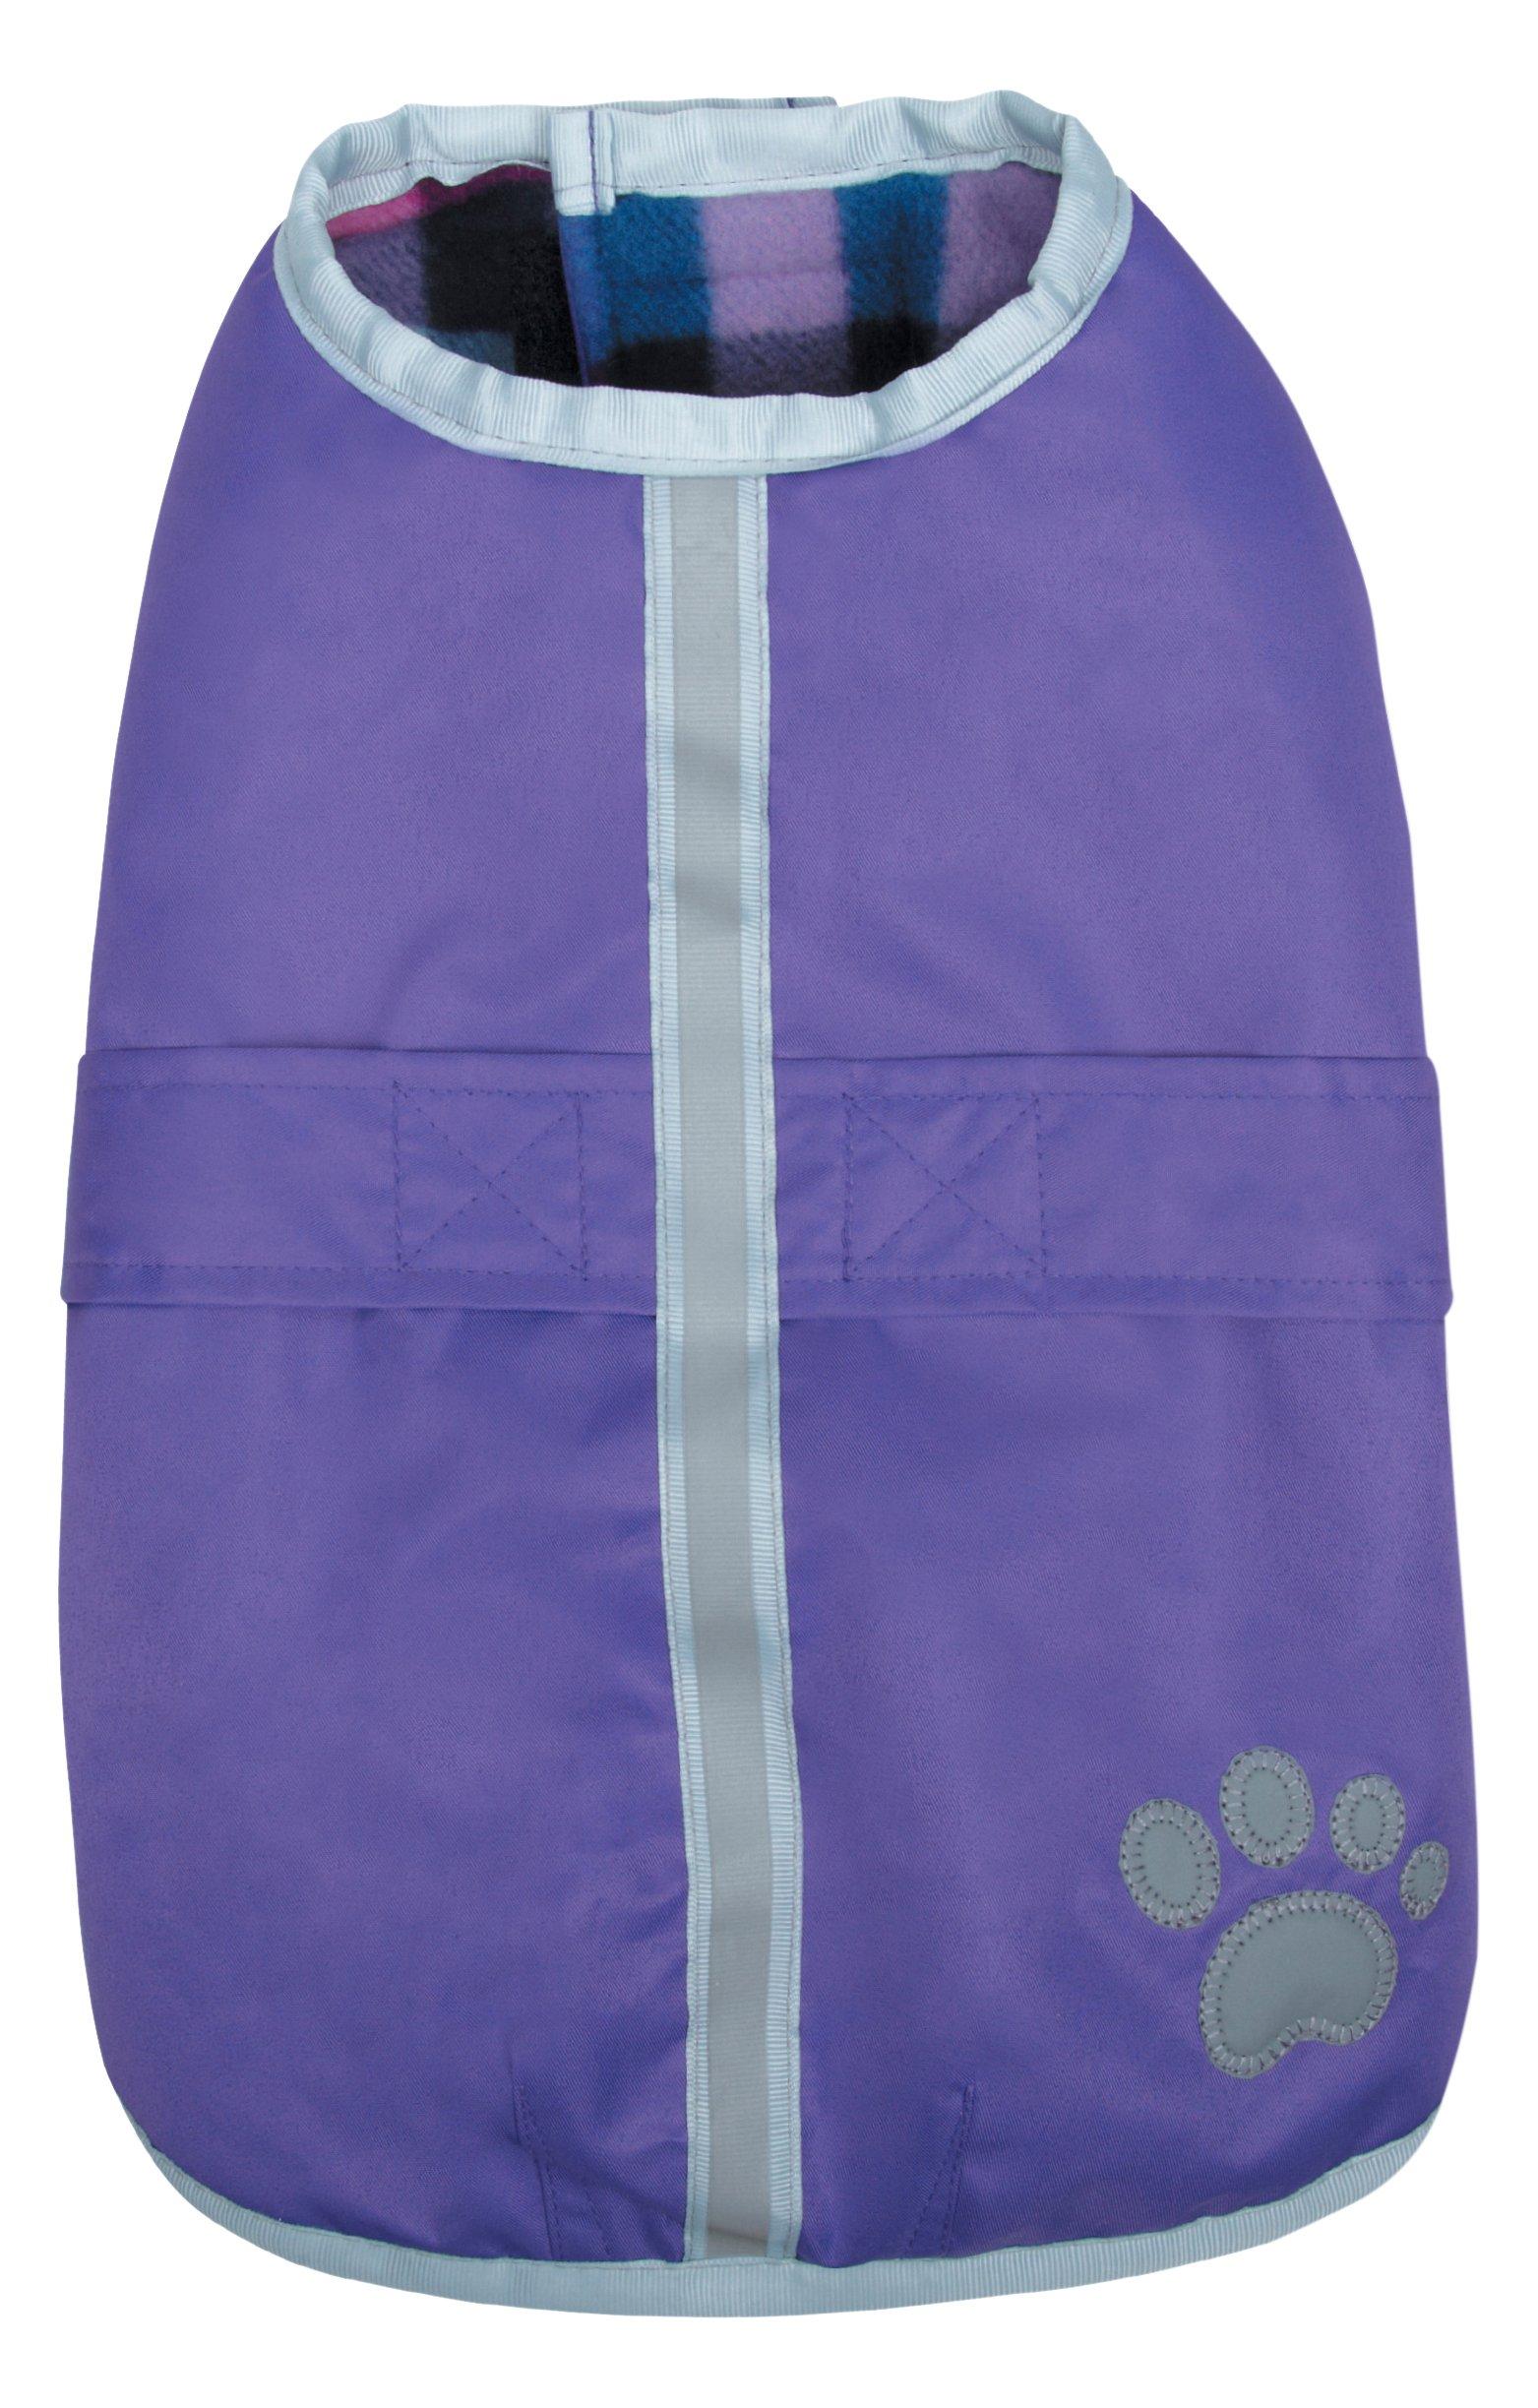 Zack & Zoey Nor'Easter Blanket Coat, X-Small, Purple